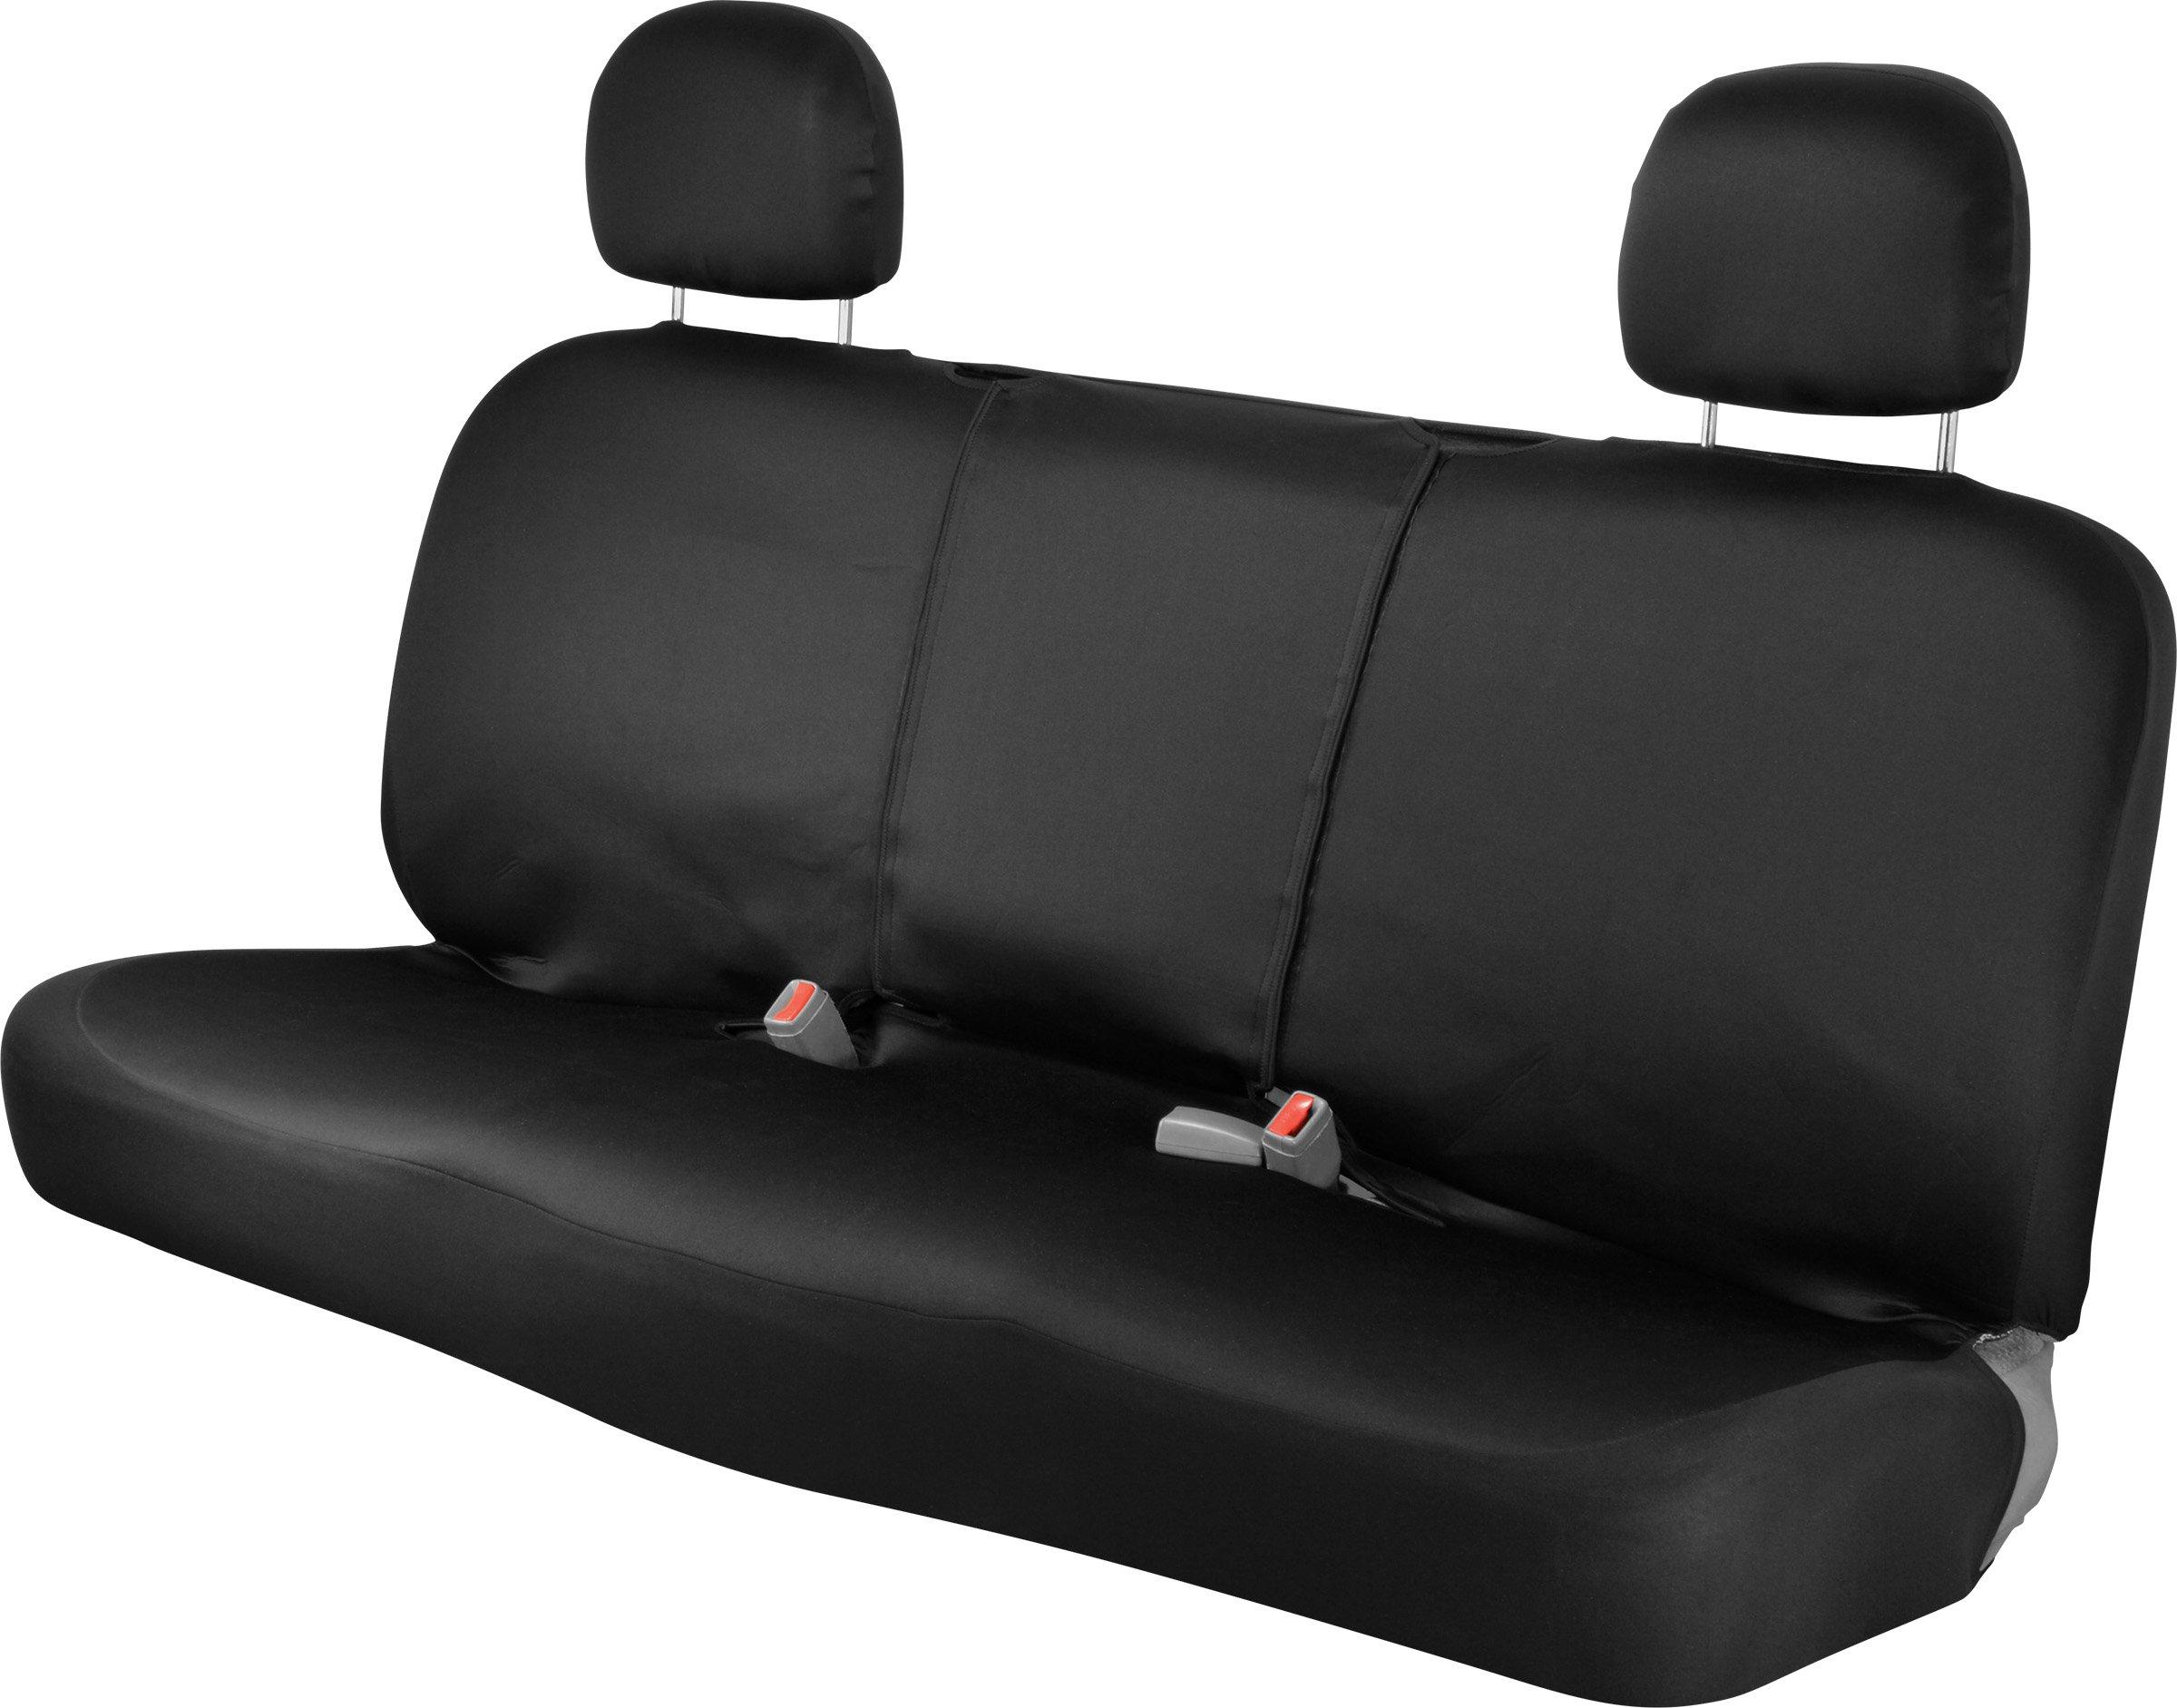 Awe Inspiring Details About Body Glove Bench Seat Cover Black 70332 9 Spiritservingveterans Wood Chair Design Ideas Spiritservingveteransorg